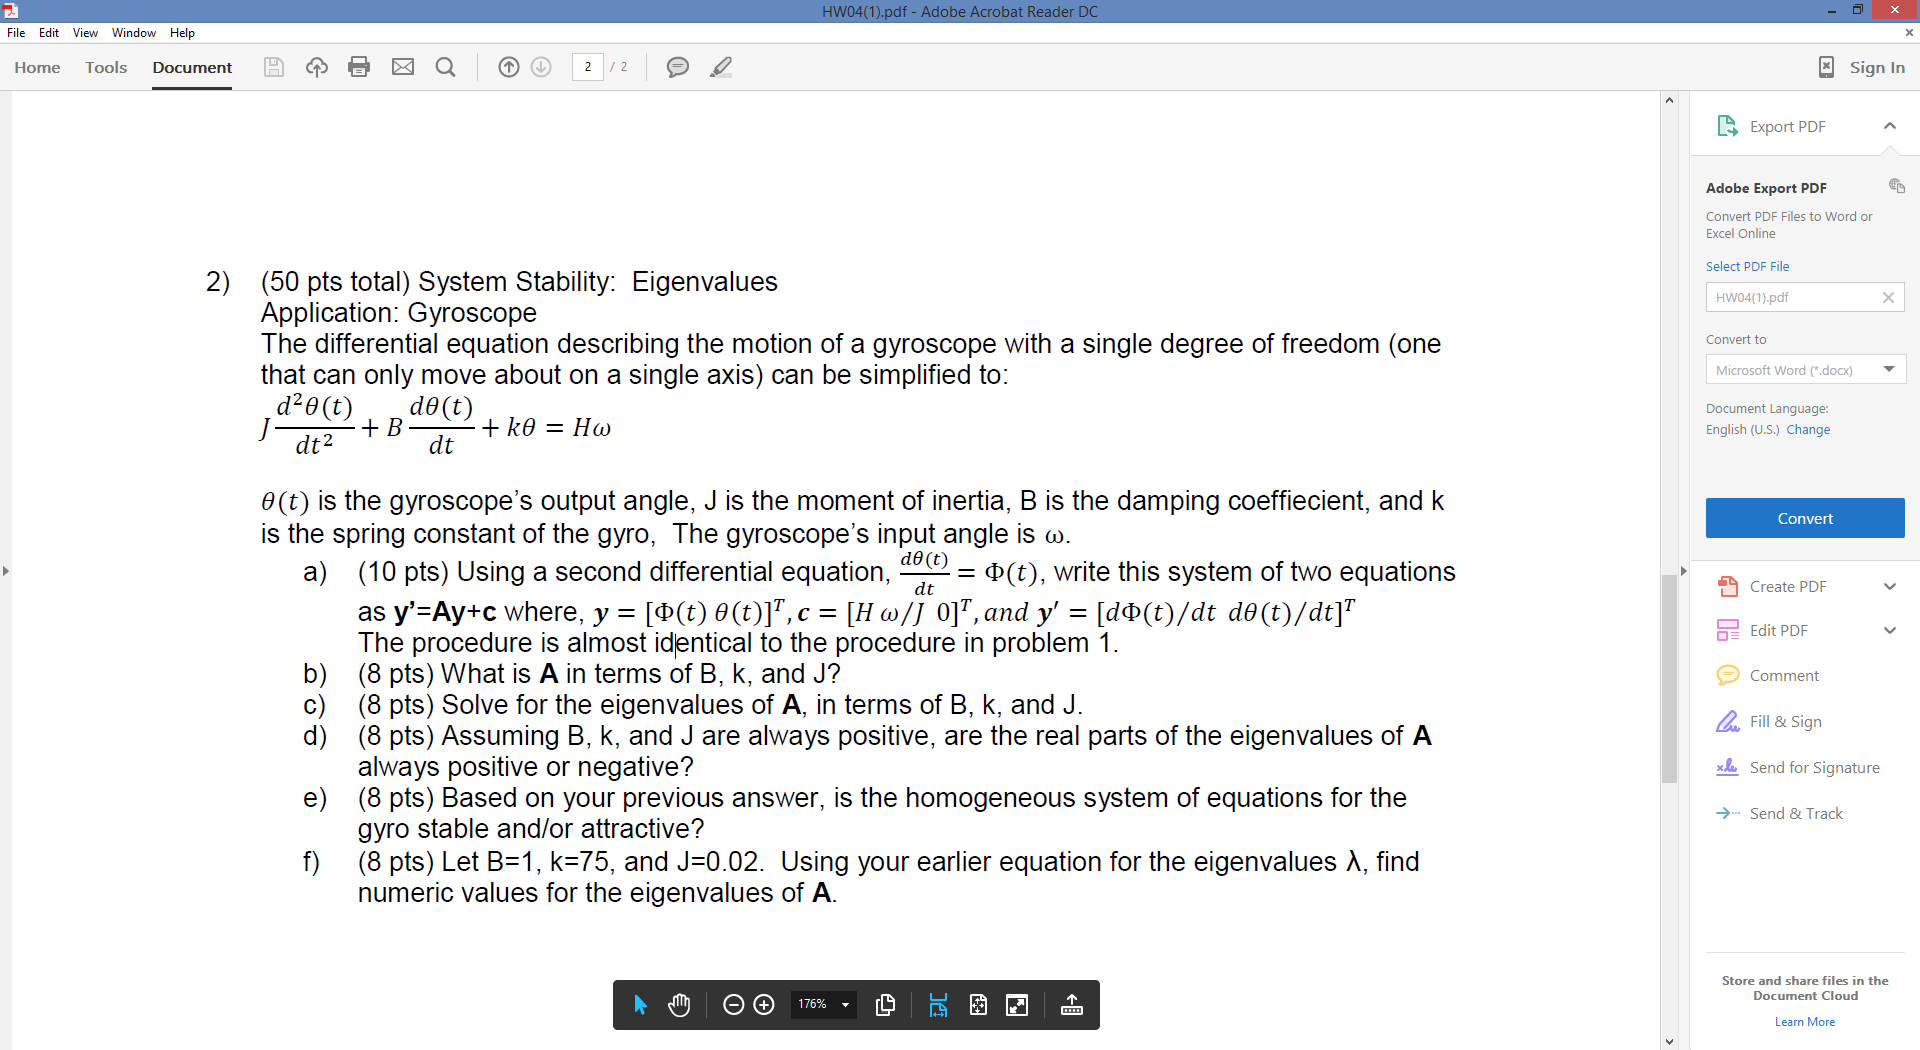 Solved: System Stability: Eigenvalues Application: Gyrosco